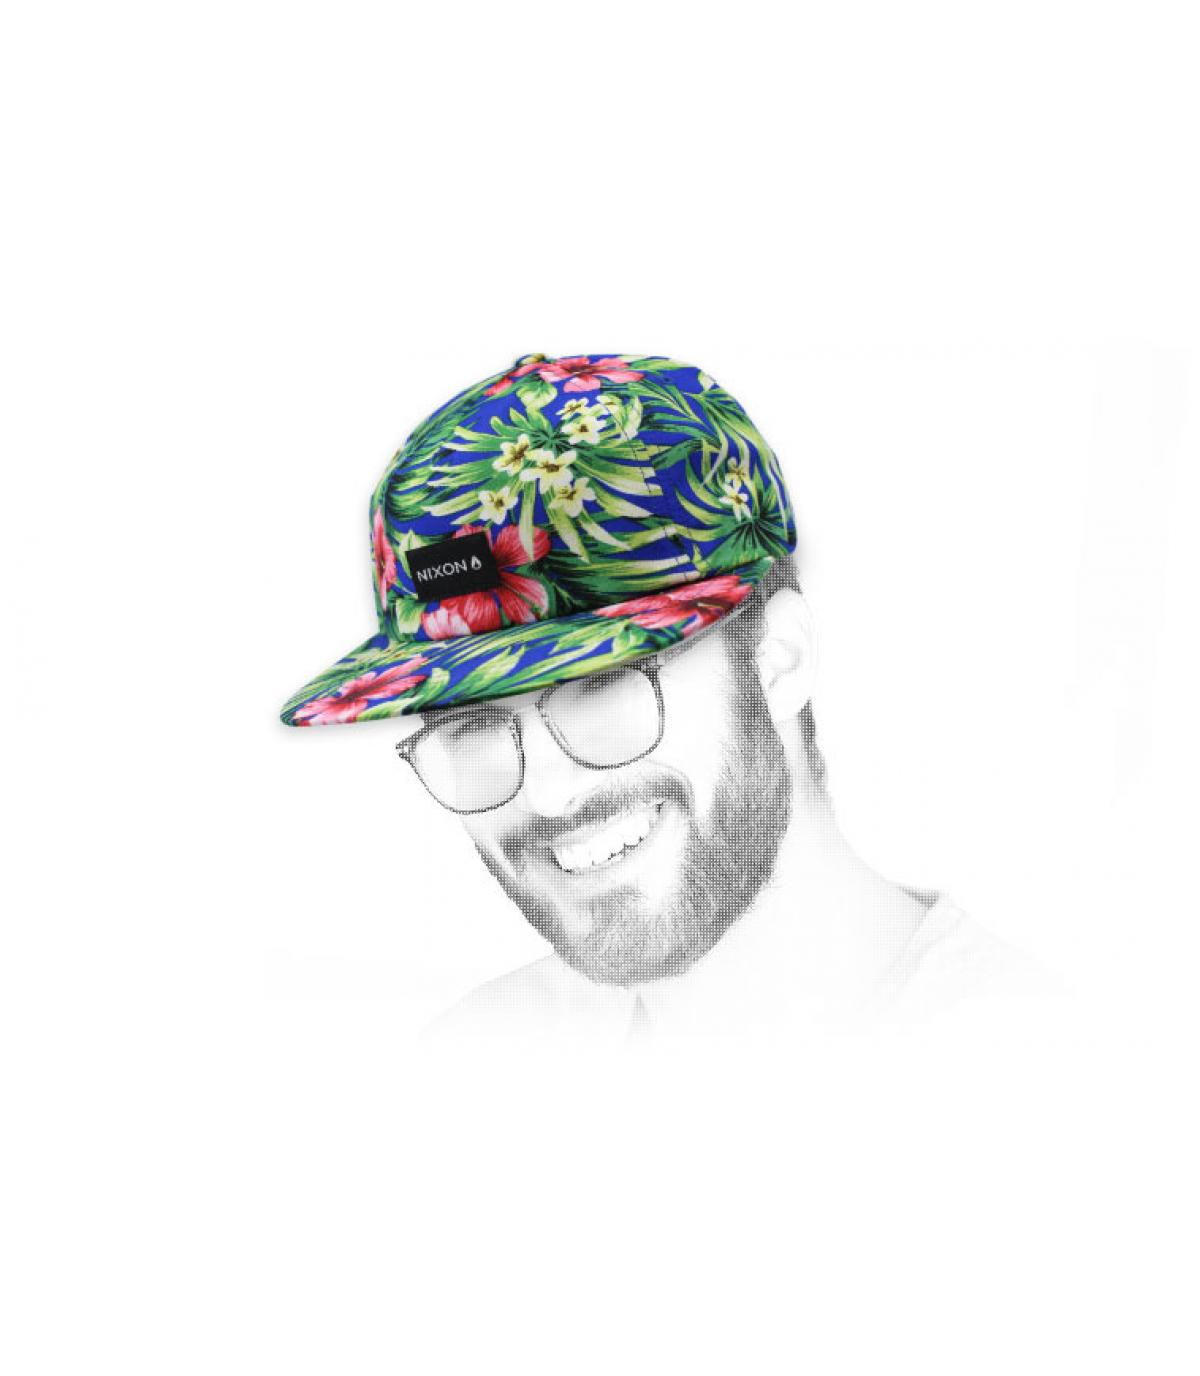 Nixon flower cap